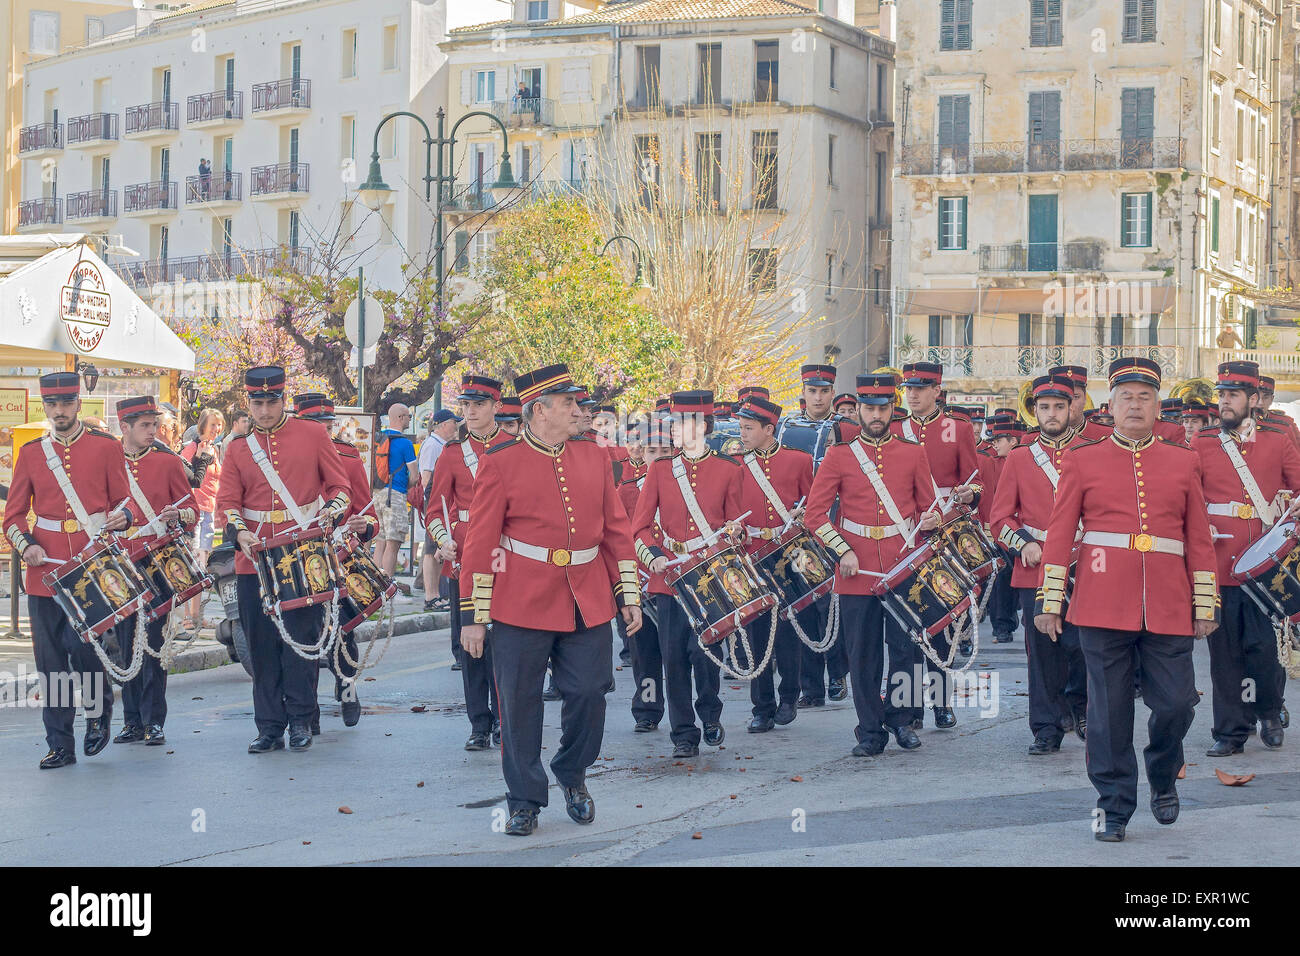 A Marching Band Corfu Ionian Islands Greece - Stock Image